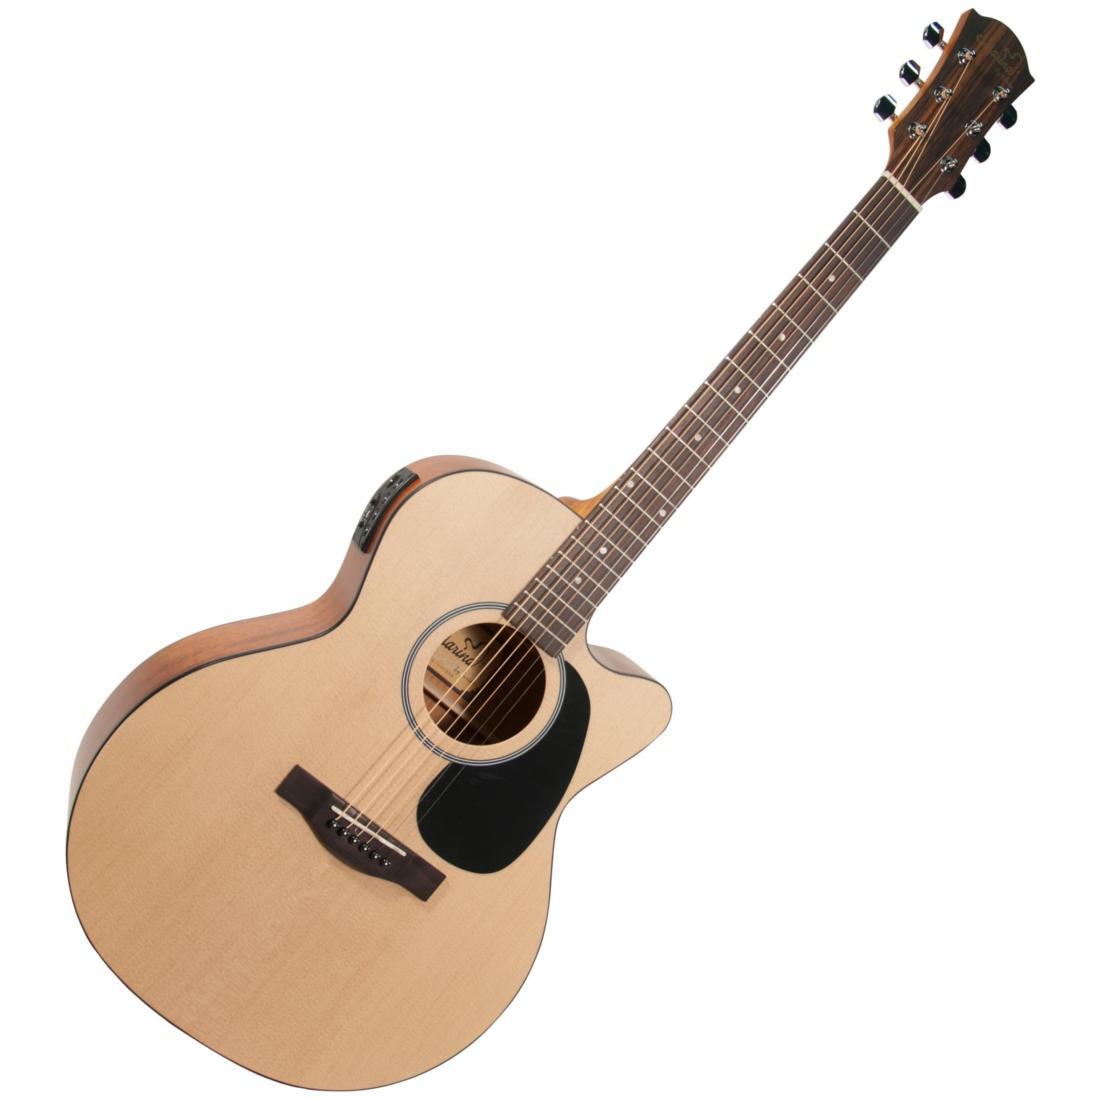 Jonathan Coulton's Guitar